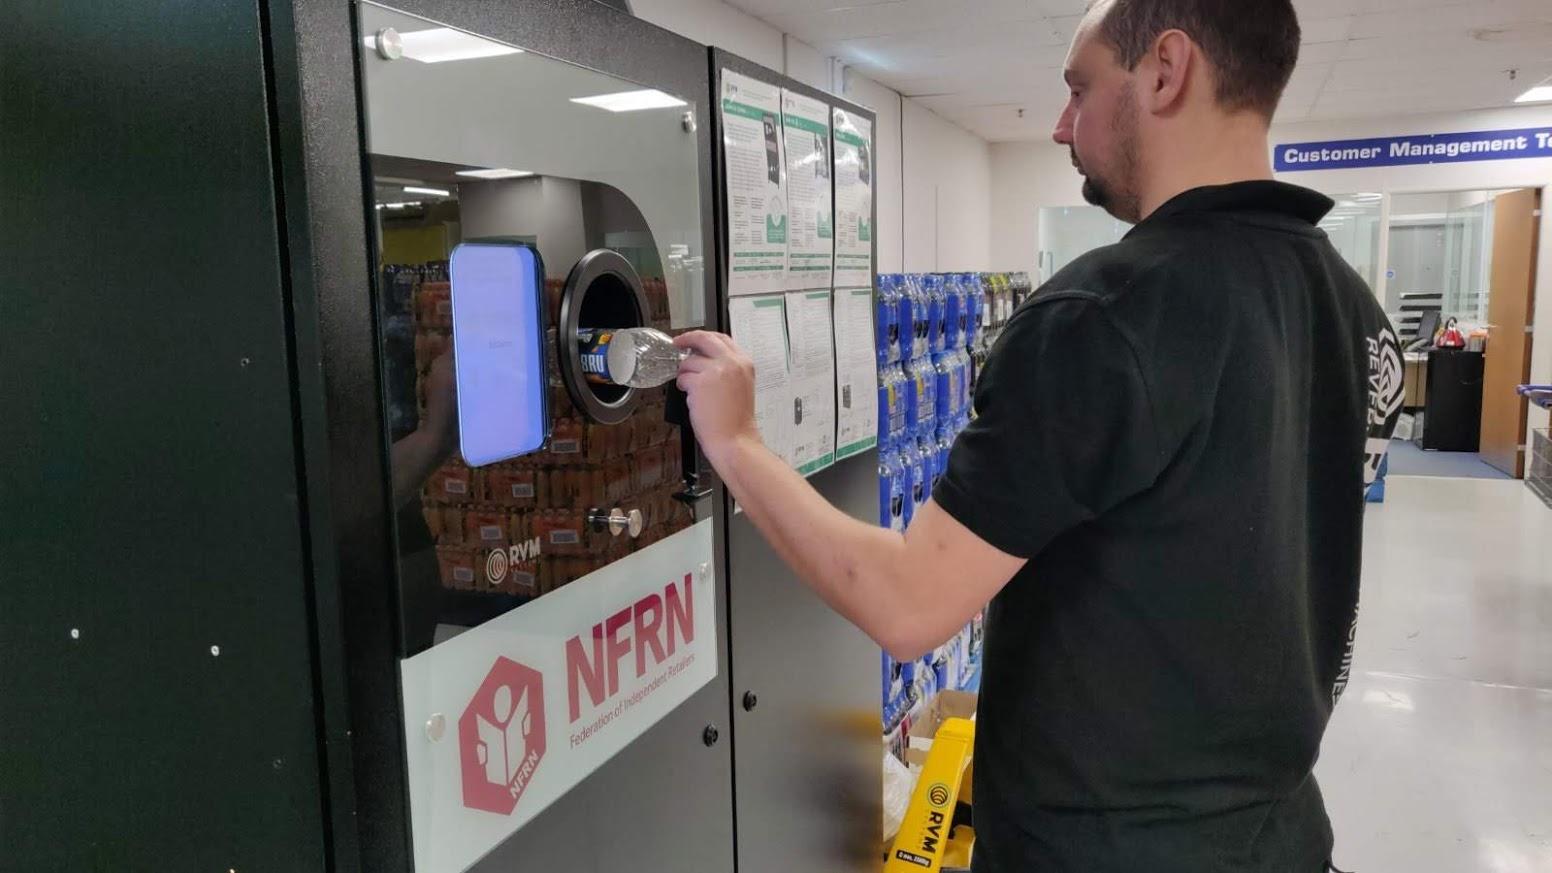 Richard using the NFRN Reverse Vending Machine